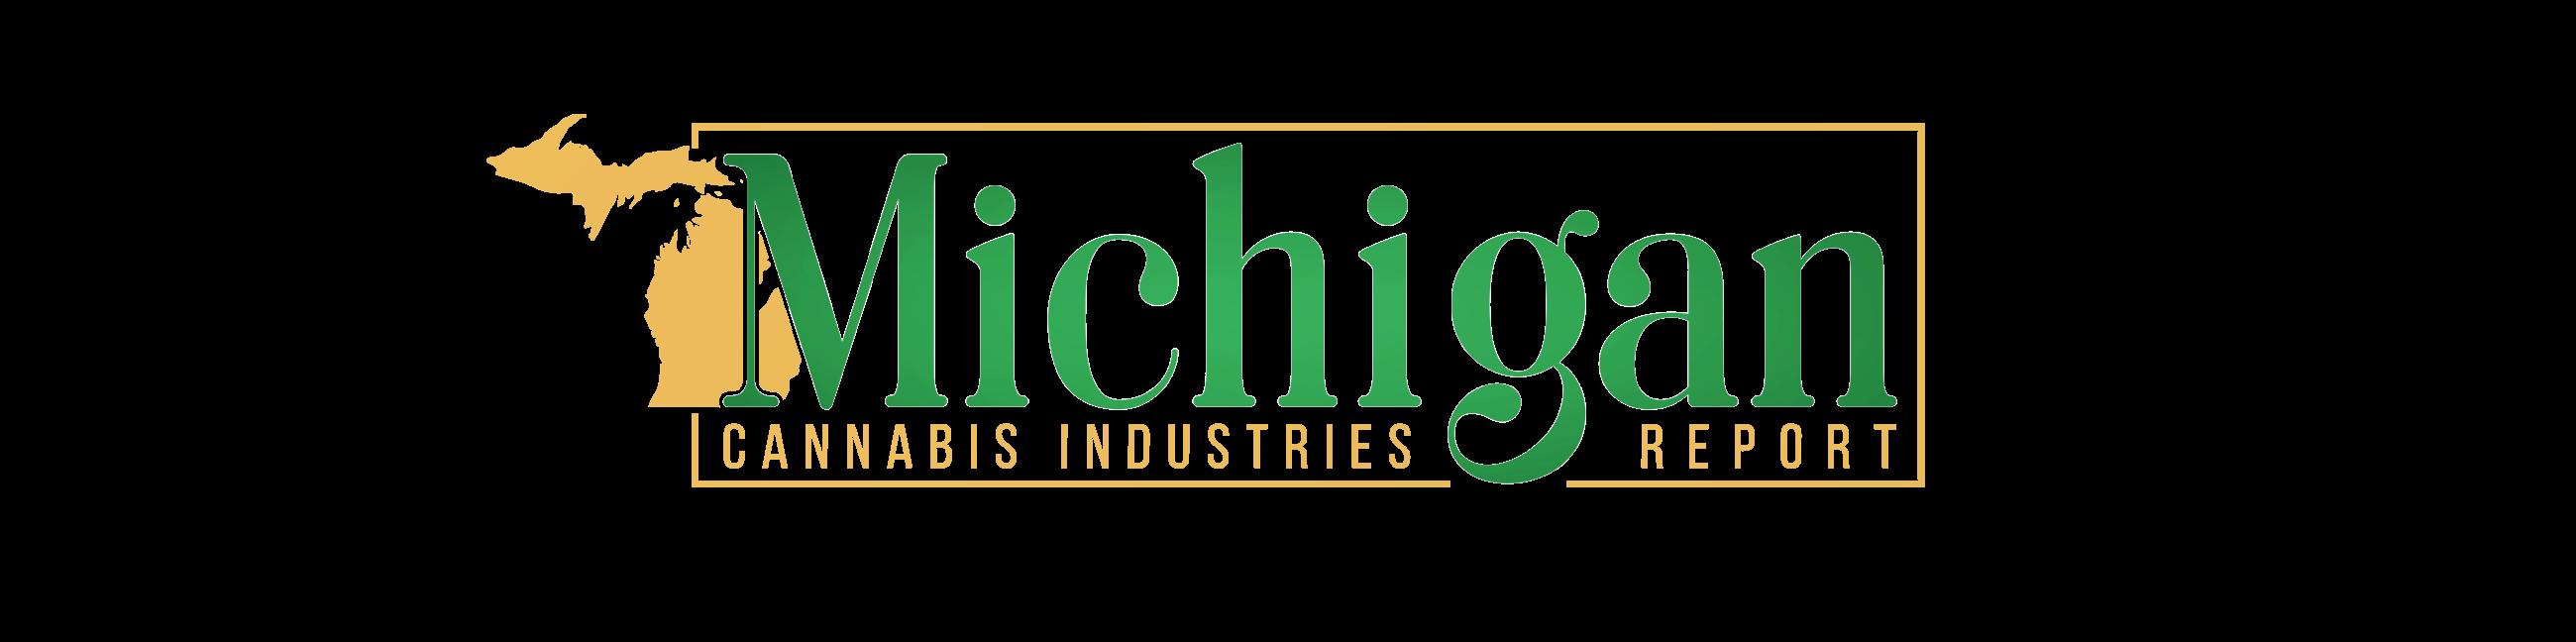 Michigan Cannabis Industries Report